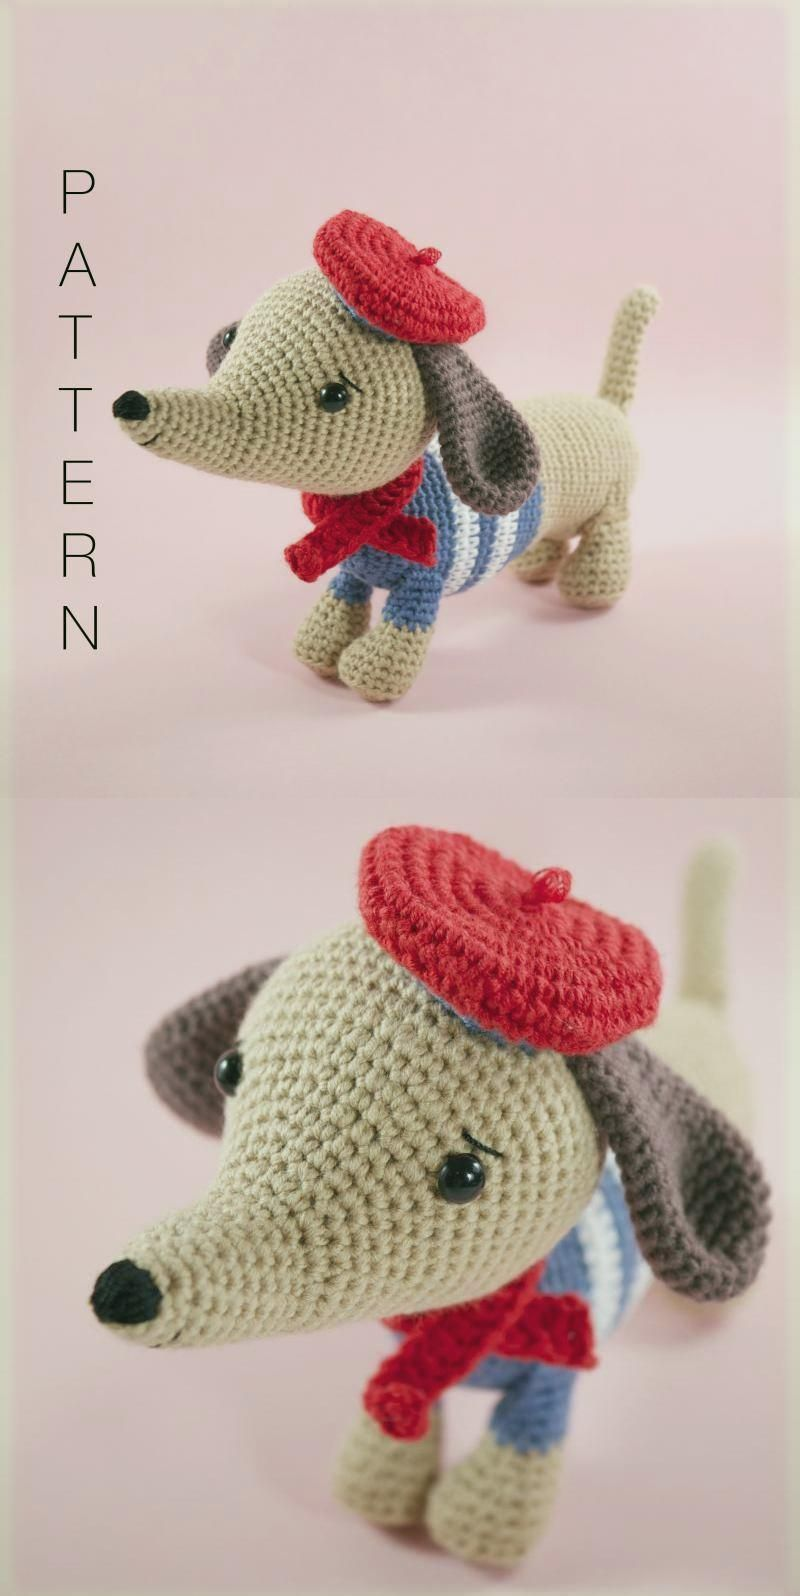 crochet sausage dog pattern - Crochet Now | 1596x800